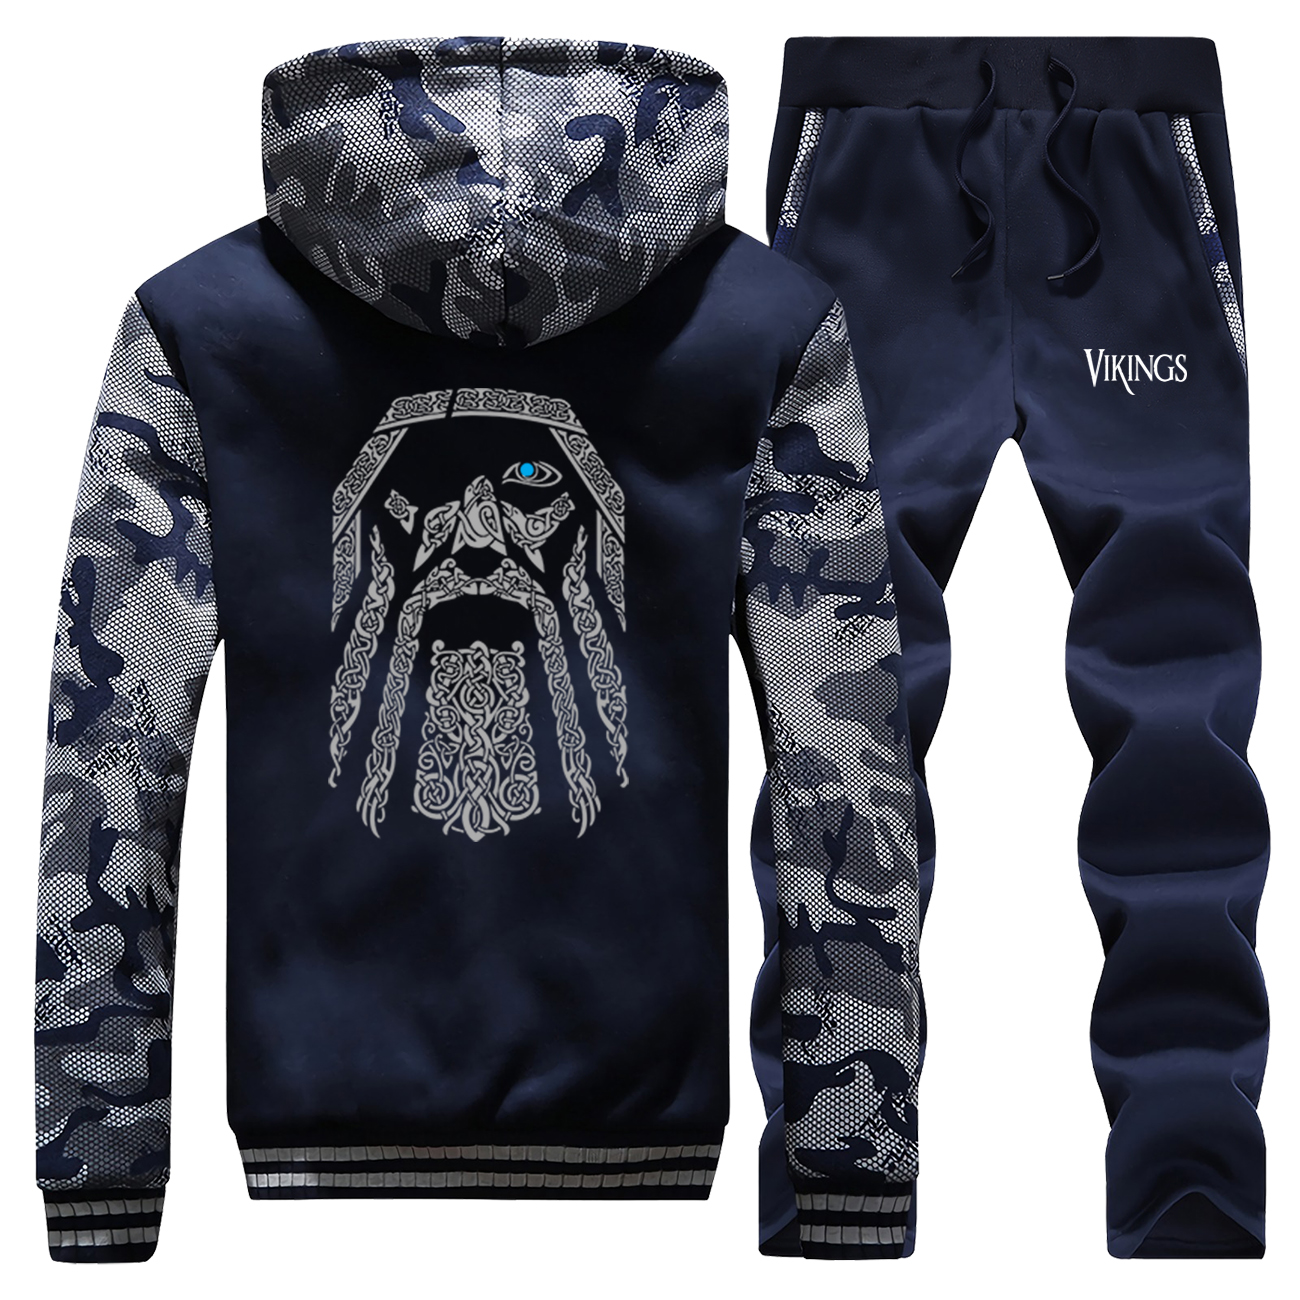 Odin Vikings Men Casual Gym Suit Fashion TV Show Camo Jackets Winter Warm Jacket Fleece Military Cool Men's Full Suit Tracksuit